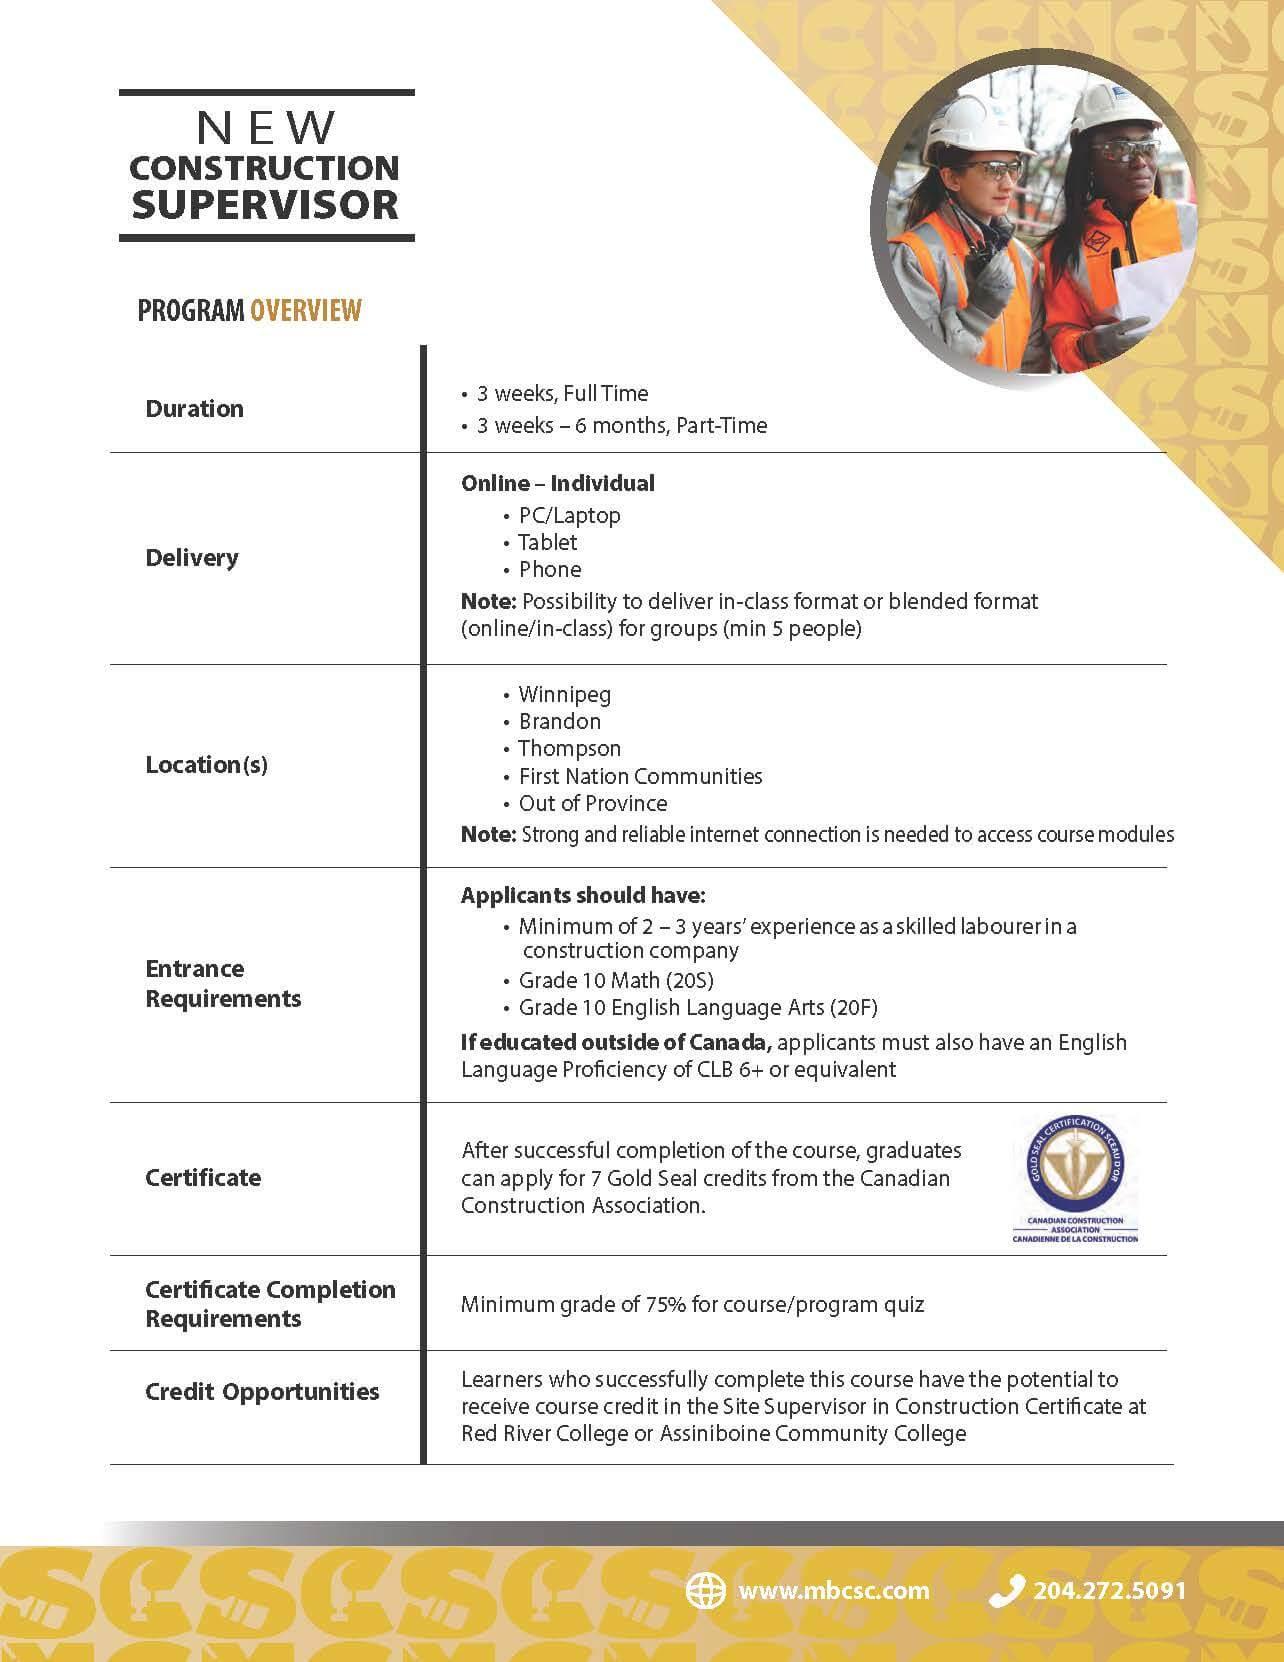 New Construction Supervisor Course